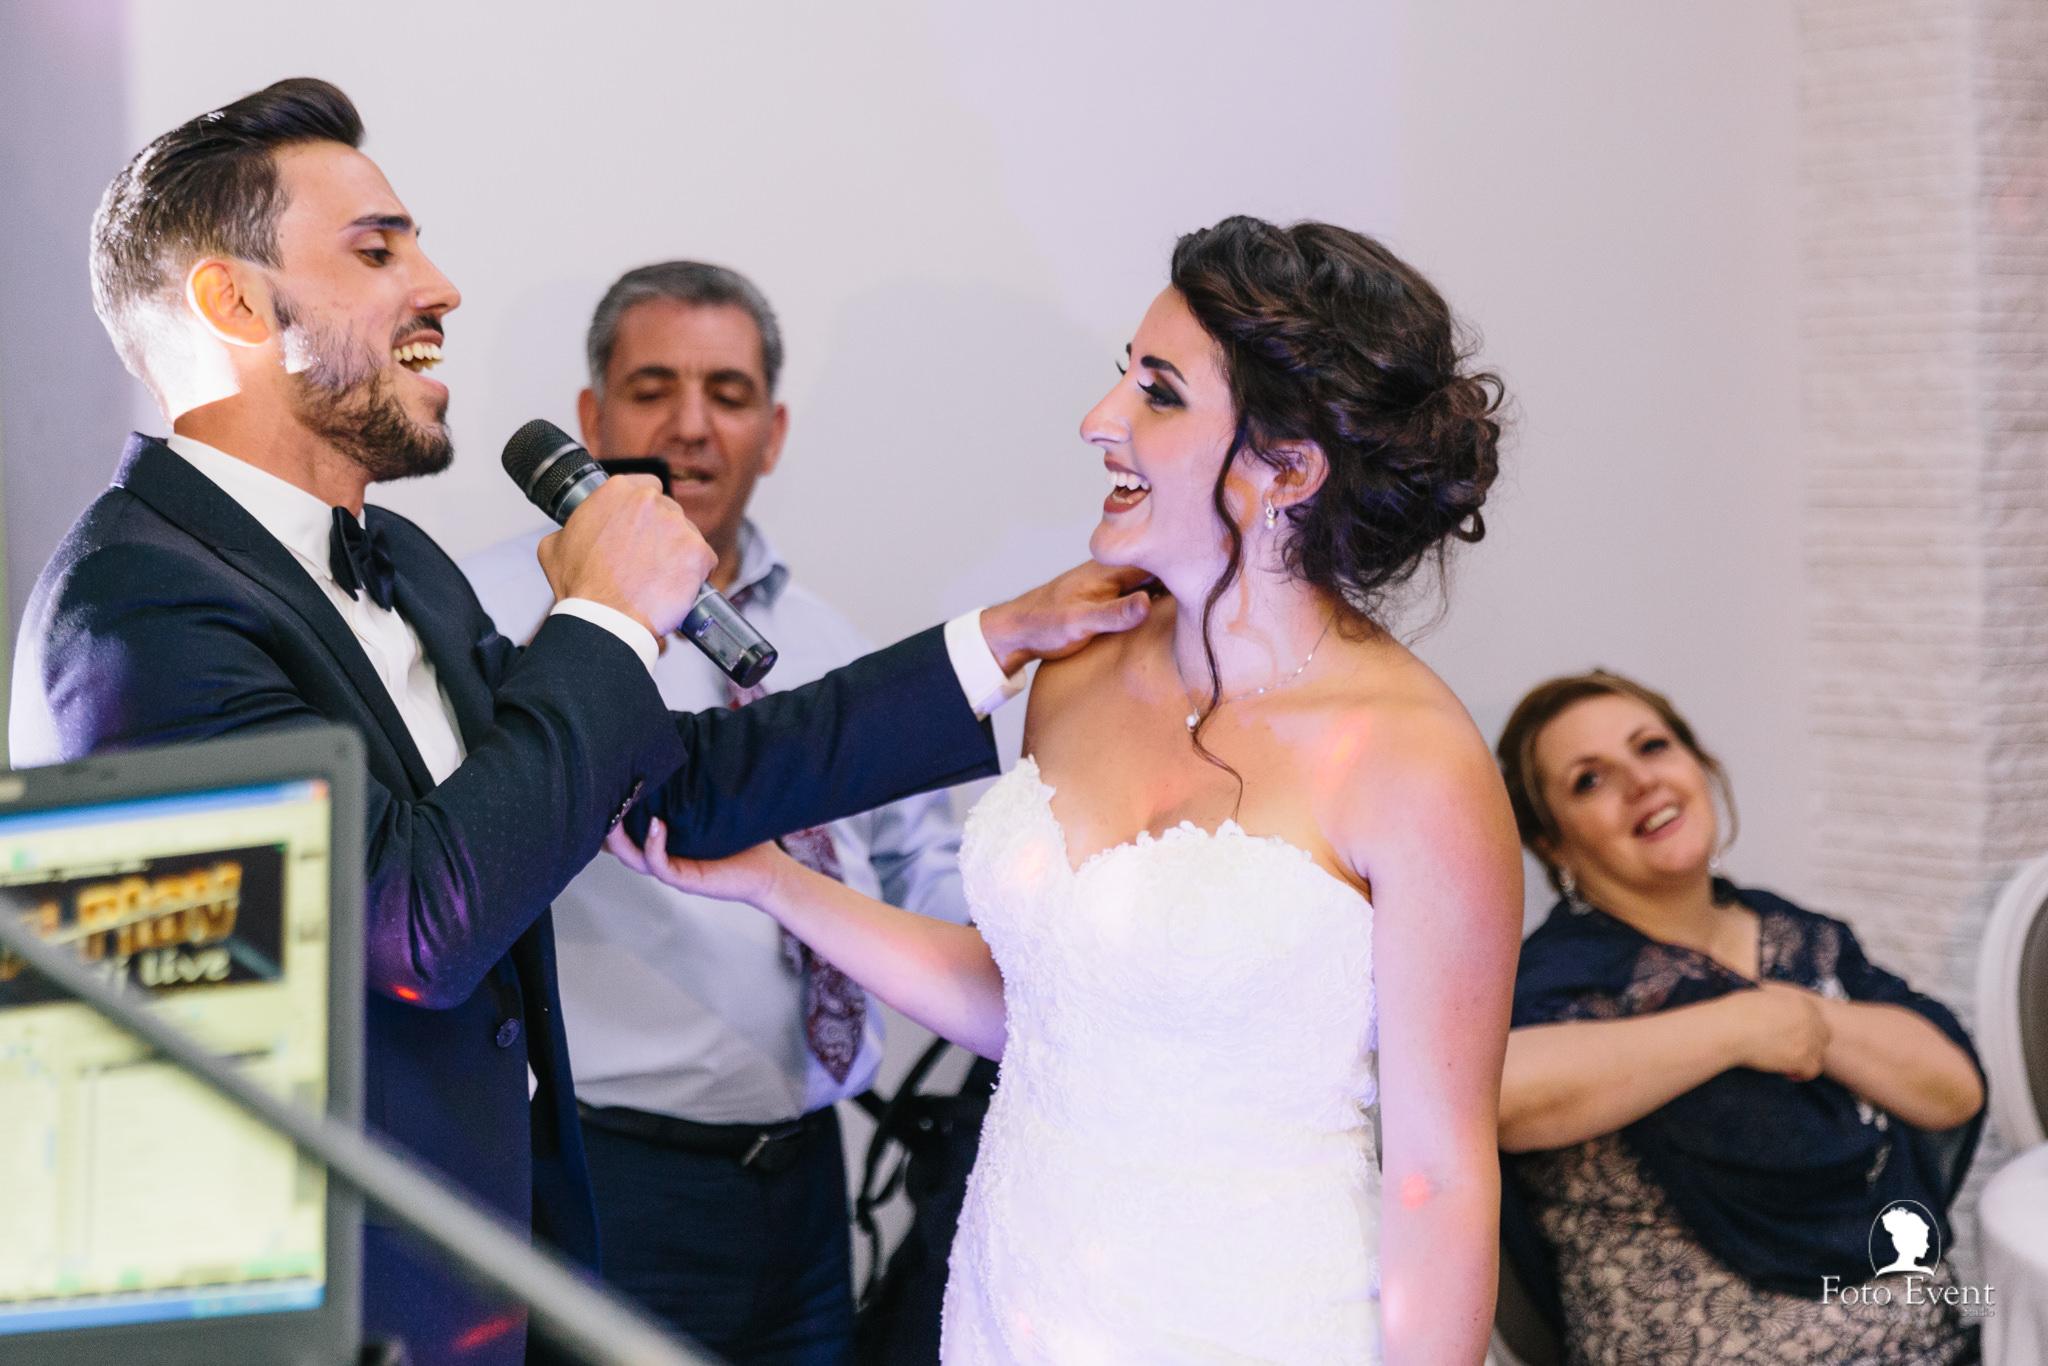 054-2019-08-31-Matrimonio-Serena-e-Saverio-Tarantino-5DE-1568